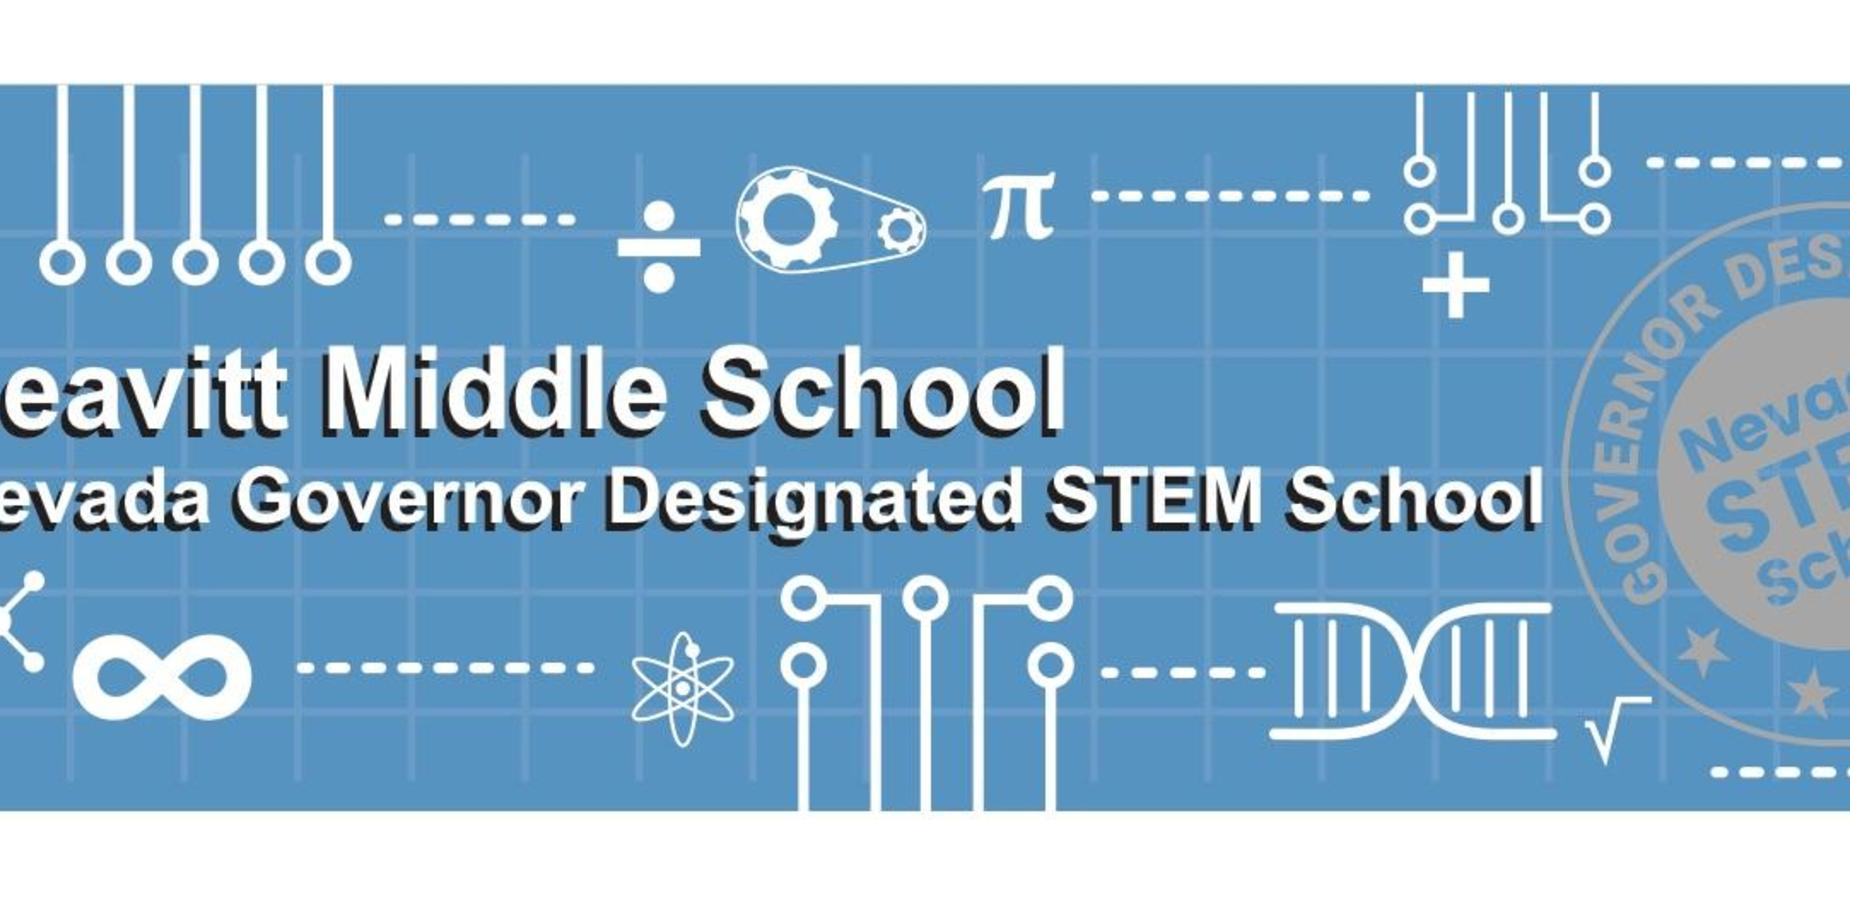 STEM School